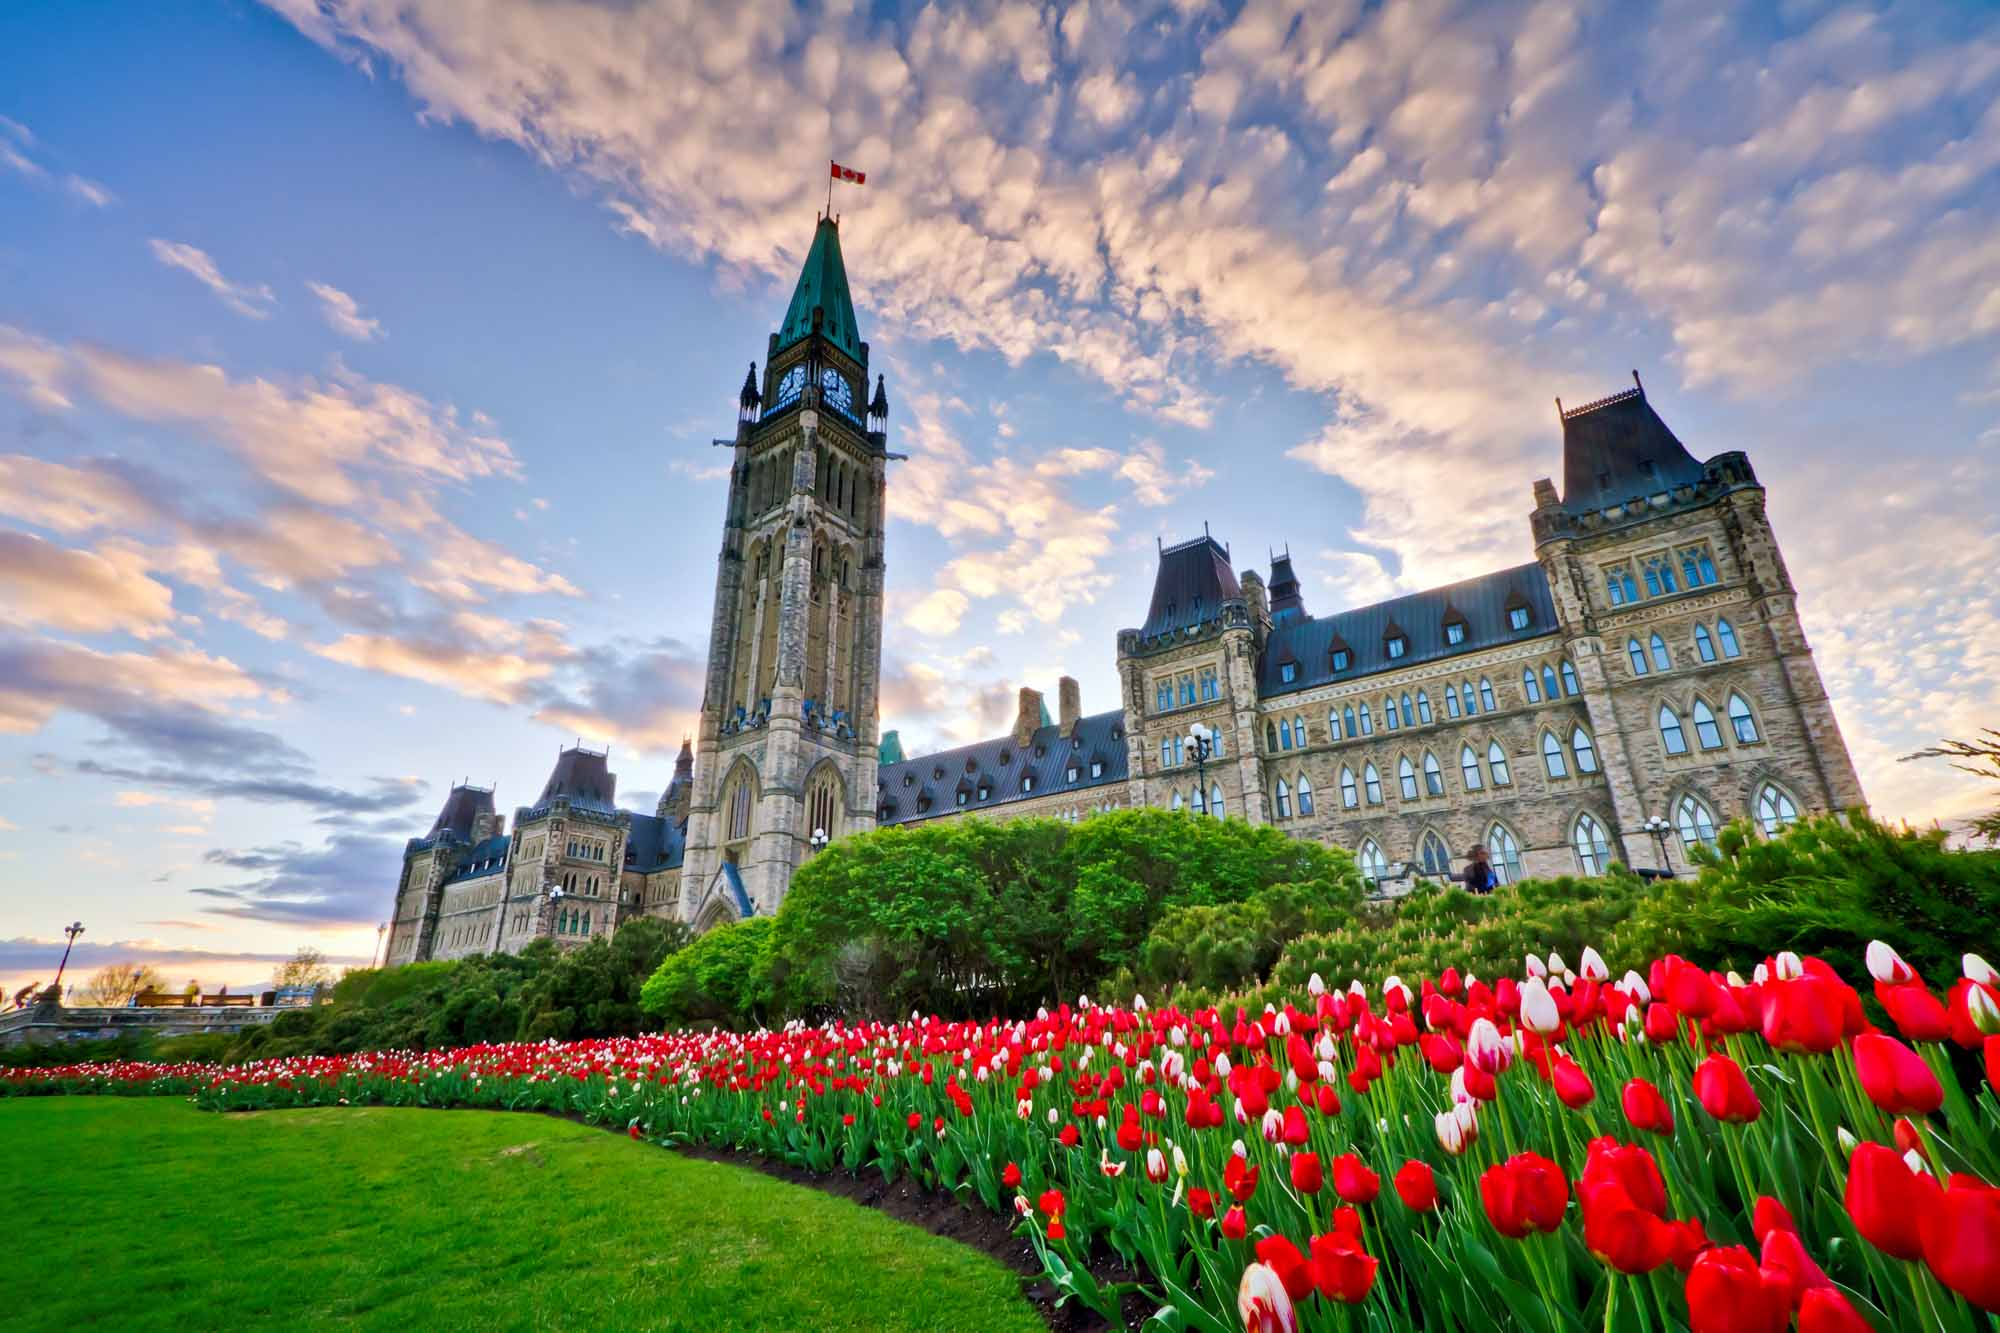 La capital de canadá